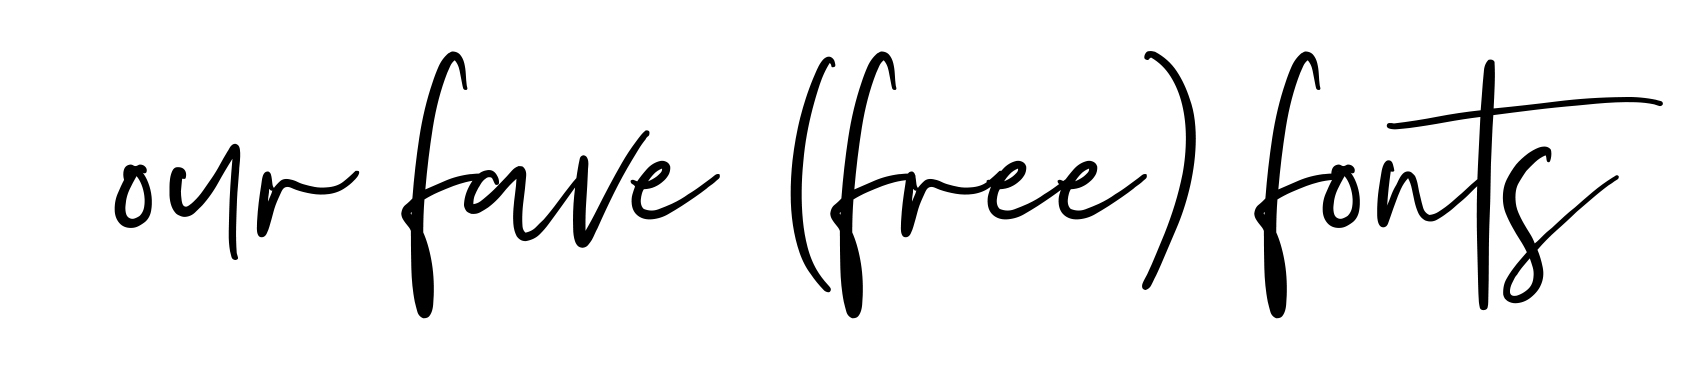 free fonts orlov design co.jpg